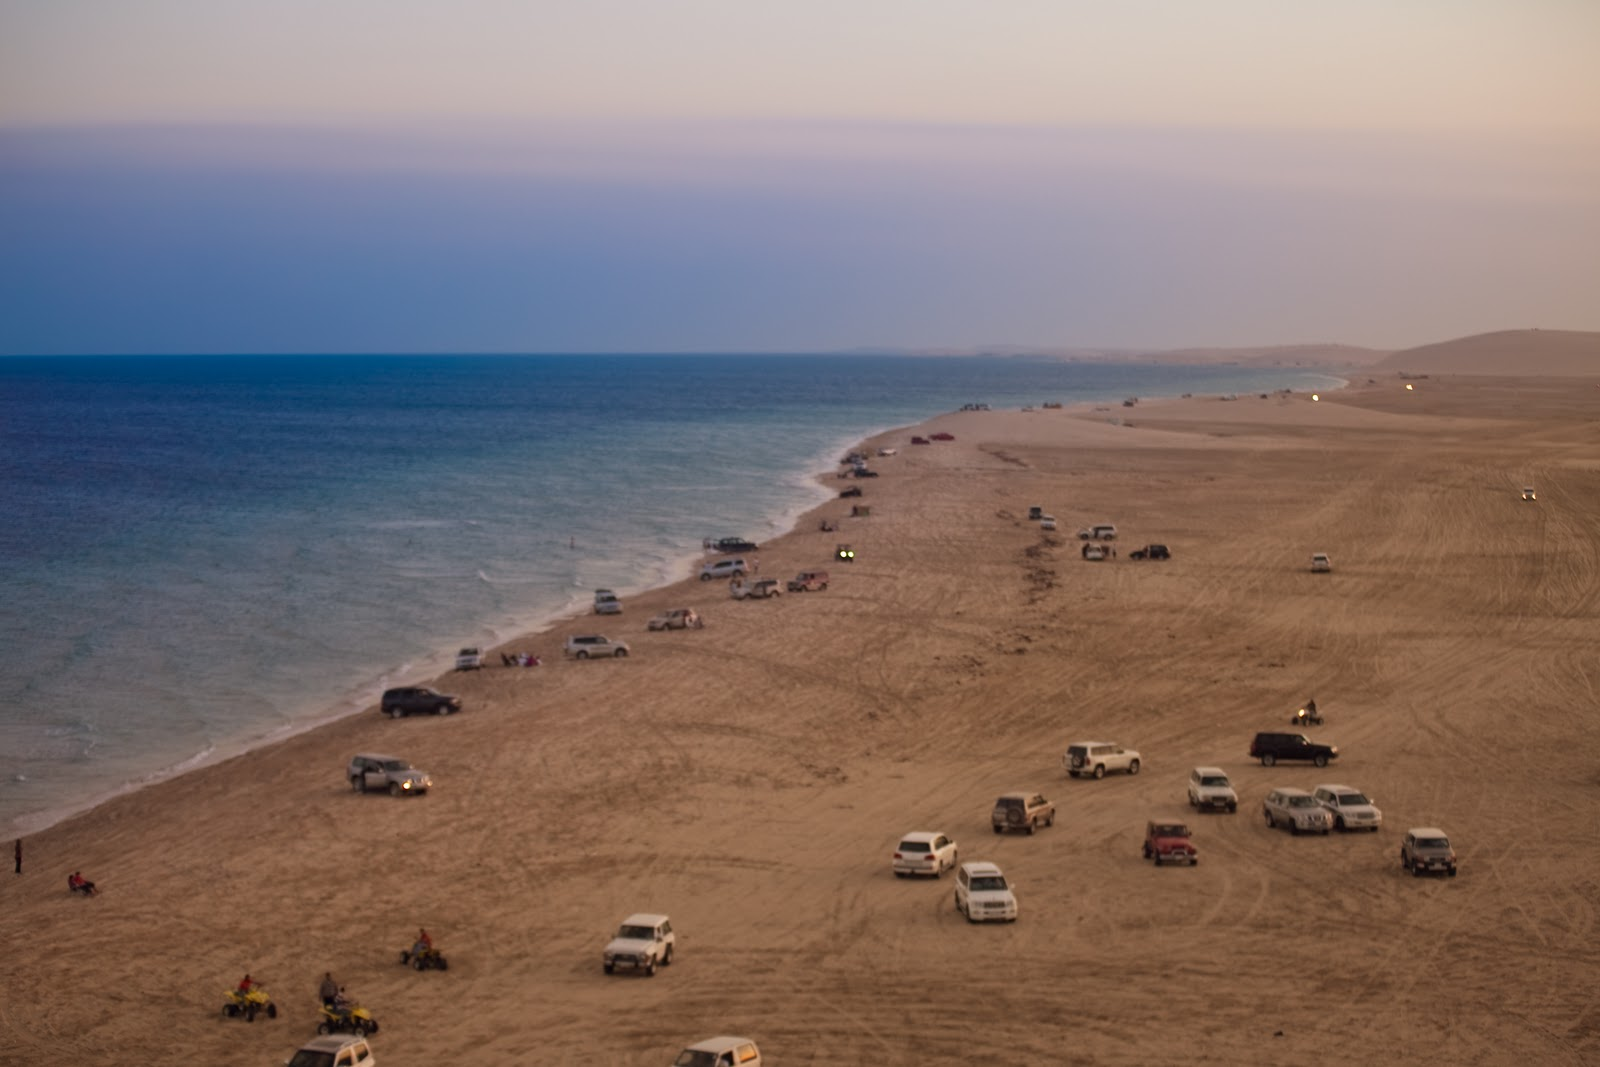 Mesaieed Qatar  City pictures : Arjunpuri in Qatar: Mesaieed Beach in Qatar